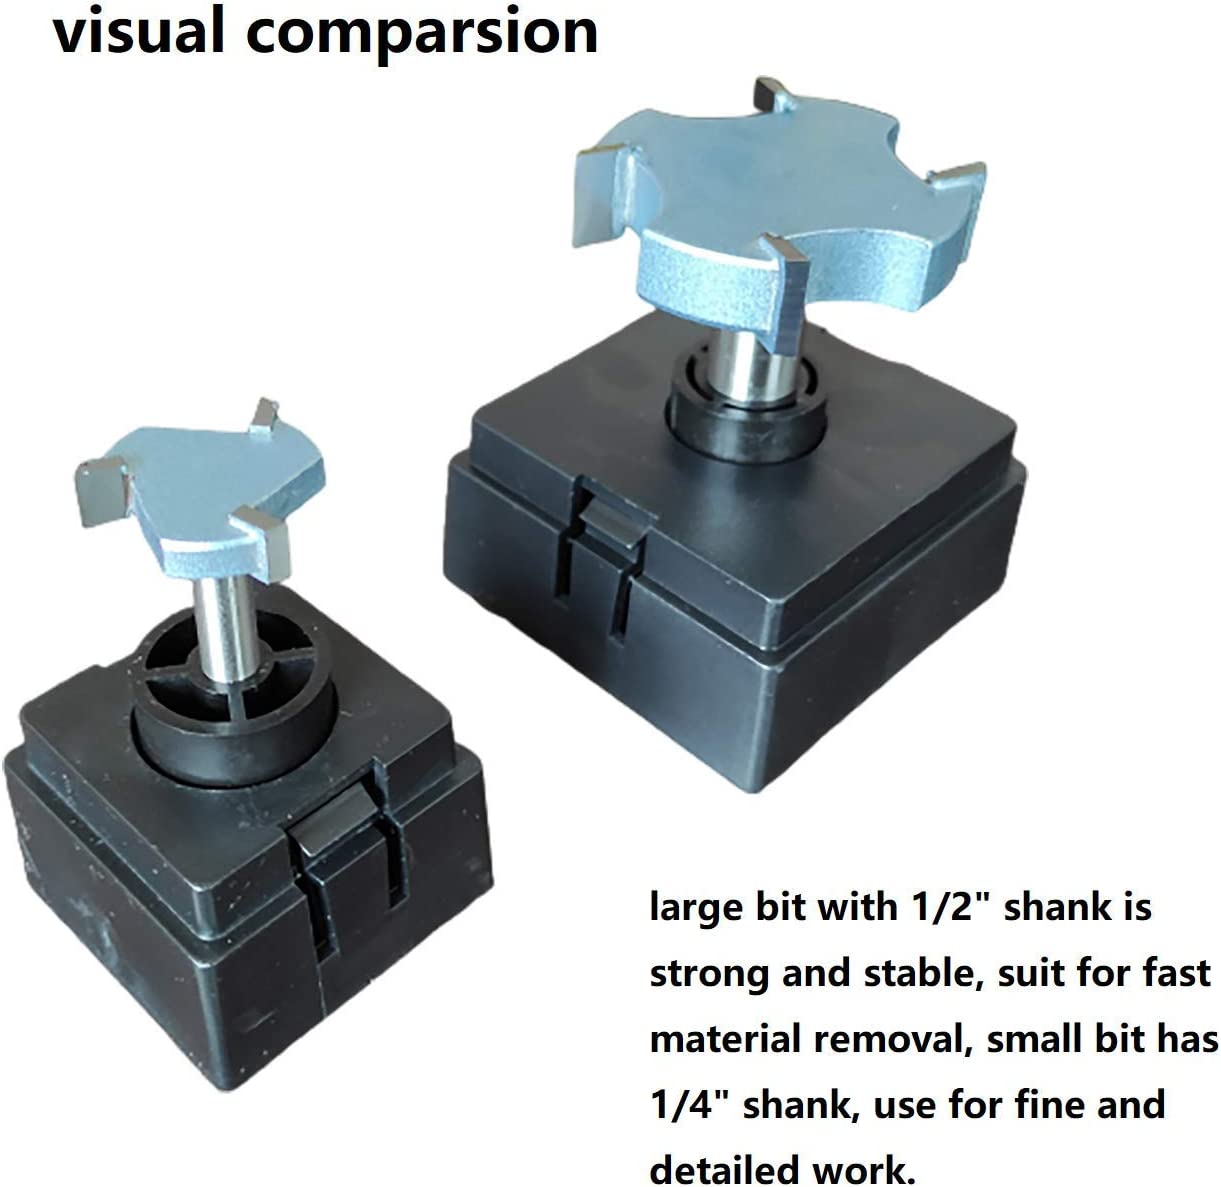 3 Wing 1//4 Shank CNC Spoilboard Surfacing Router Bit 1//4 Shank Slab Flattening bit